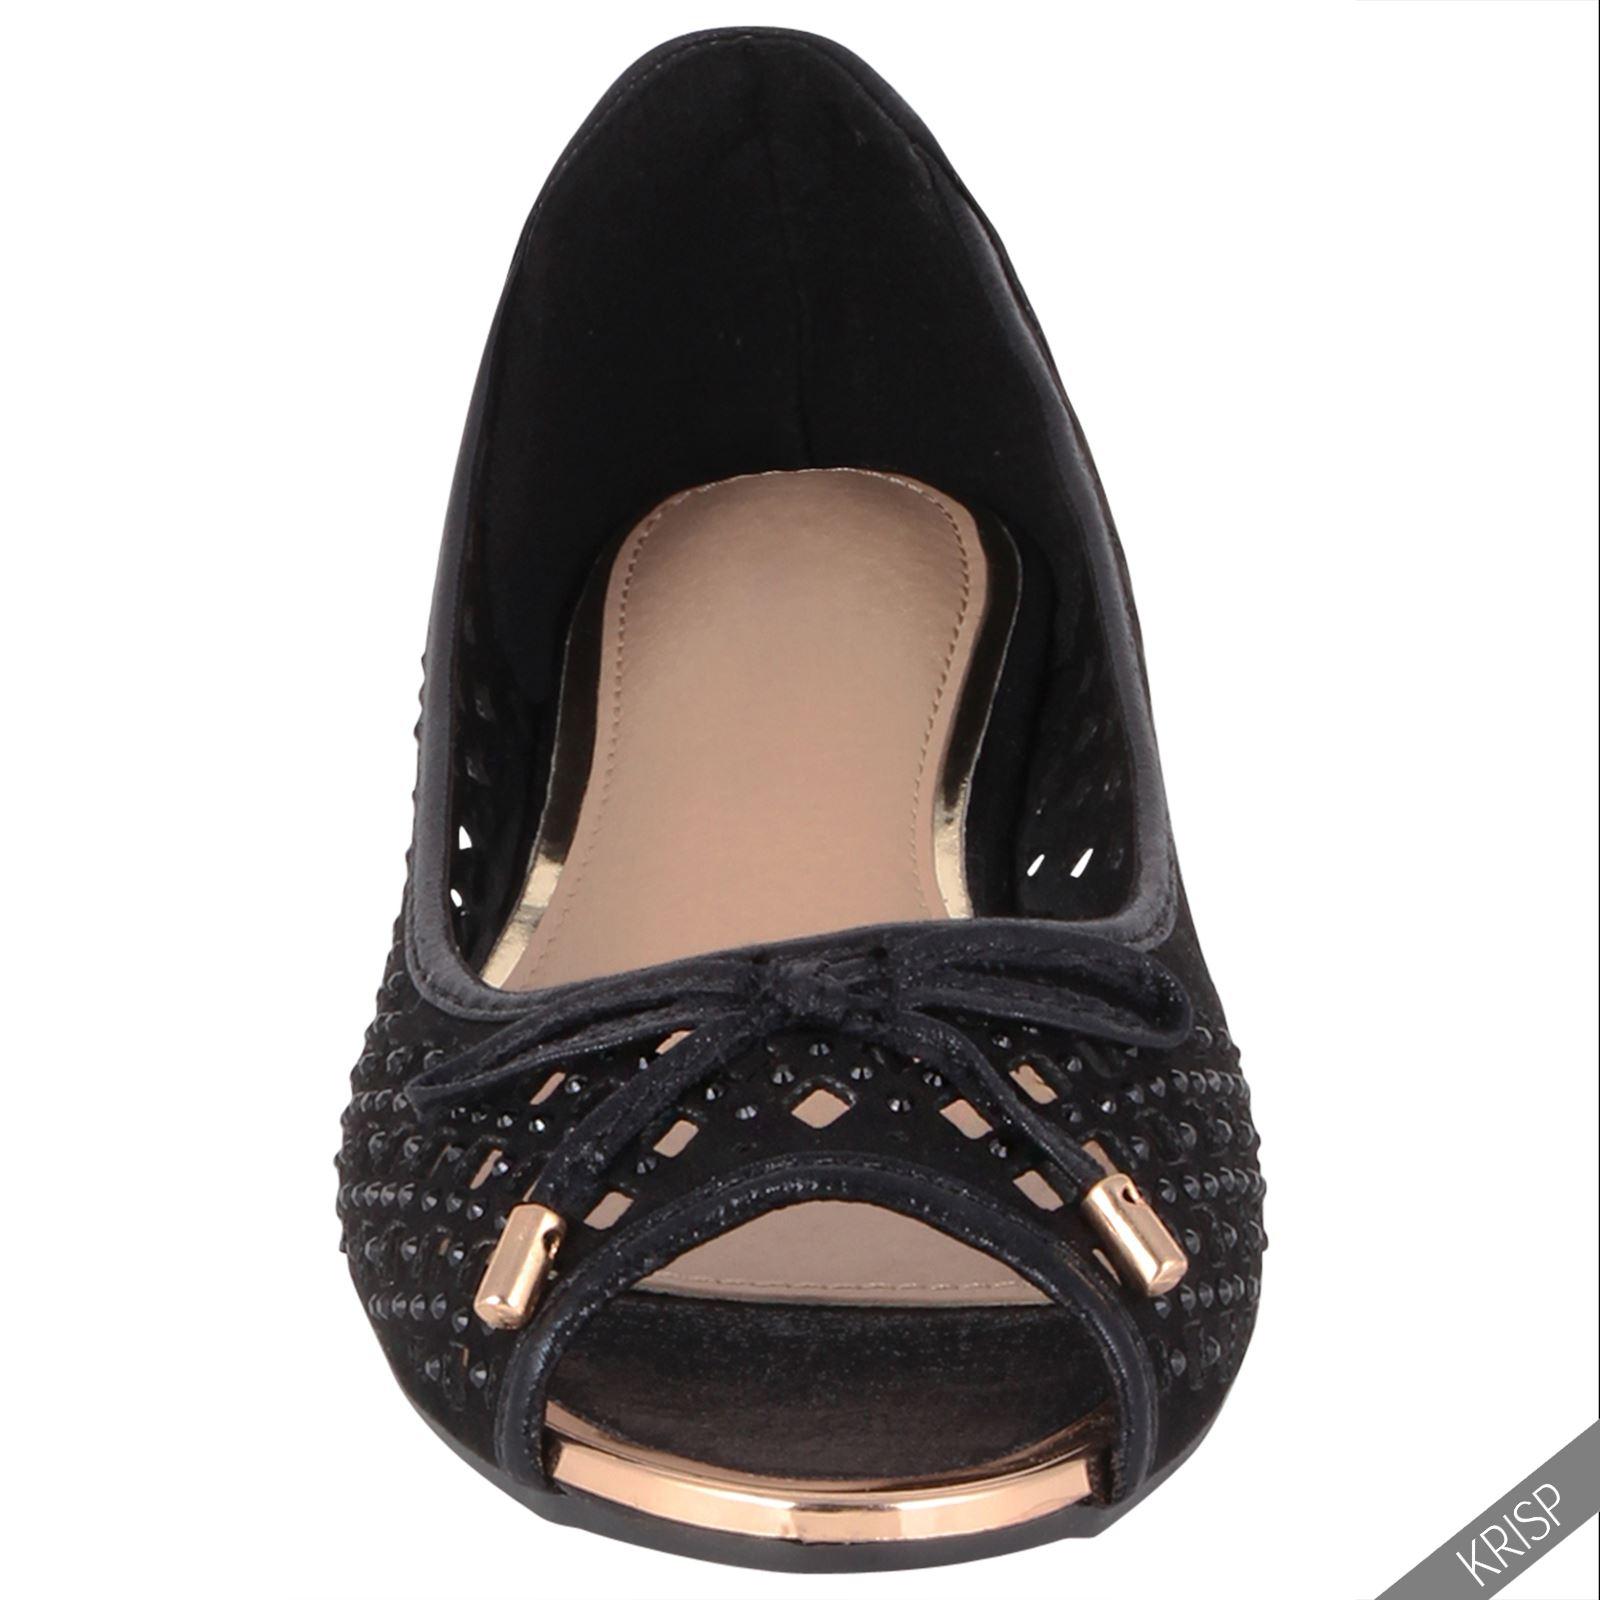 Skechers Peep Toe Shoes